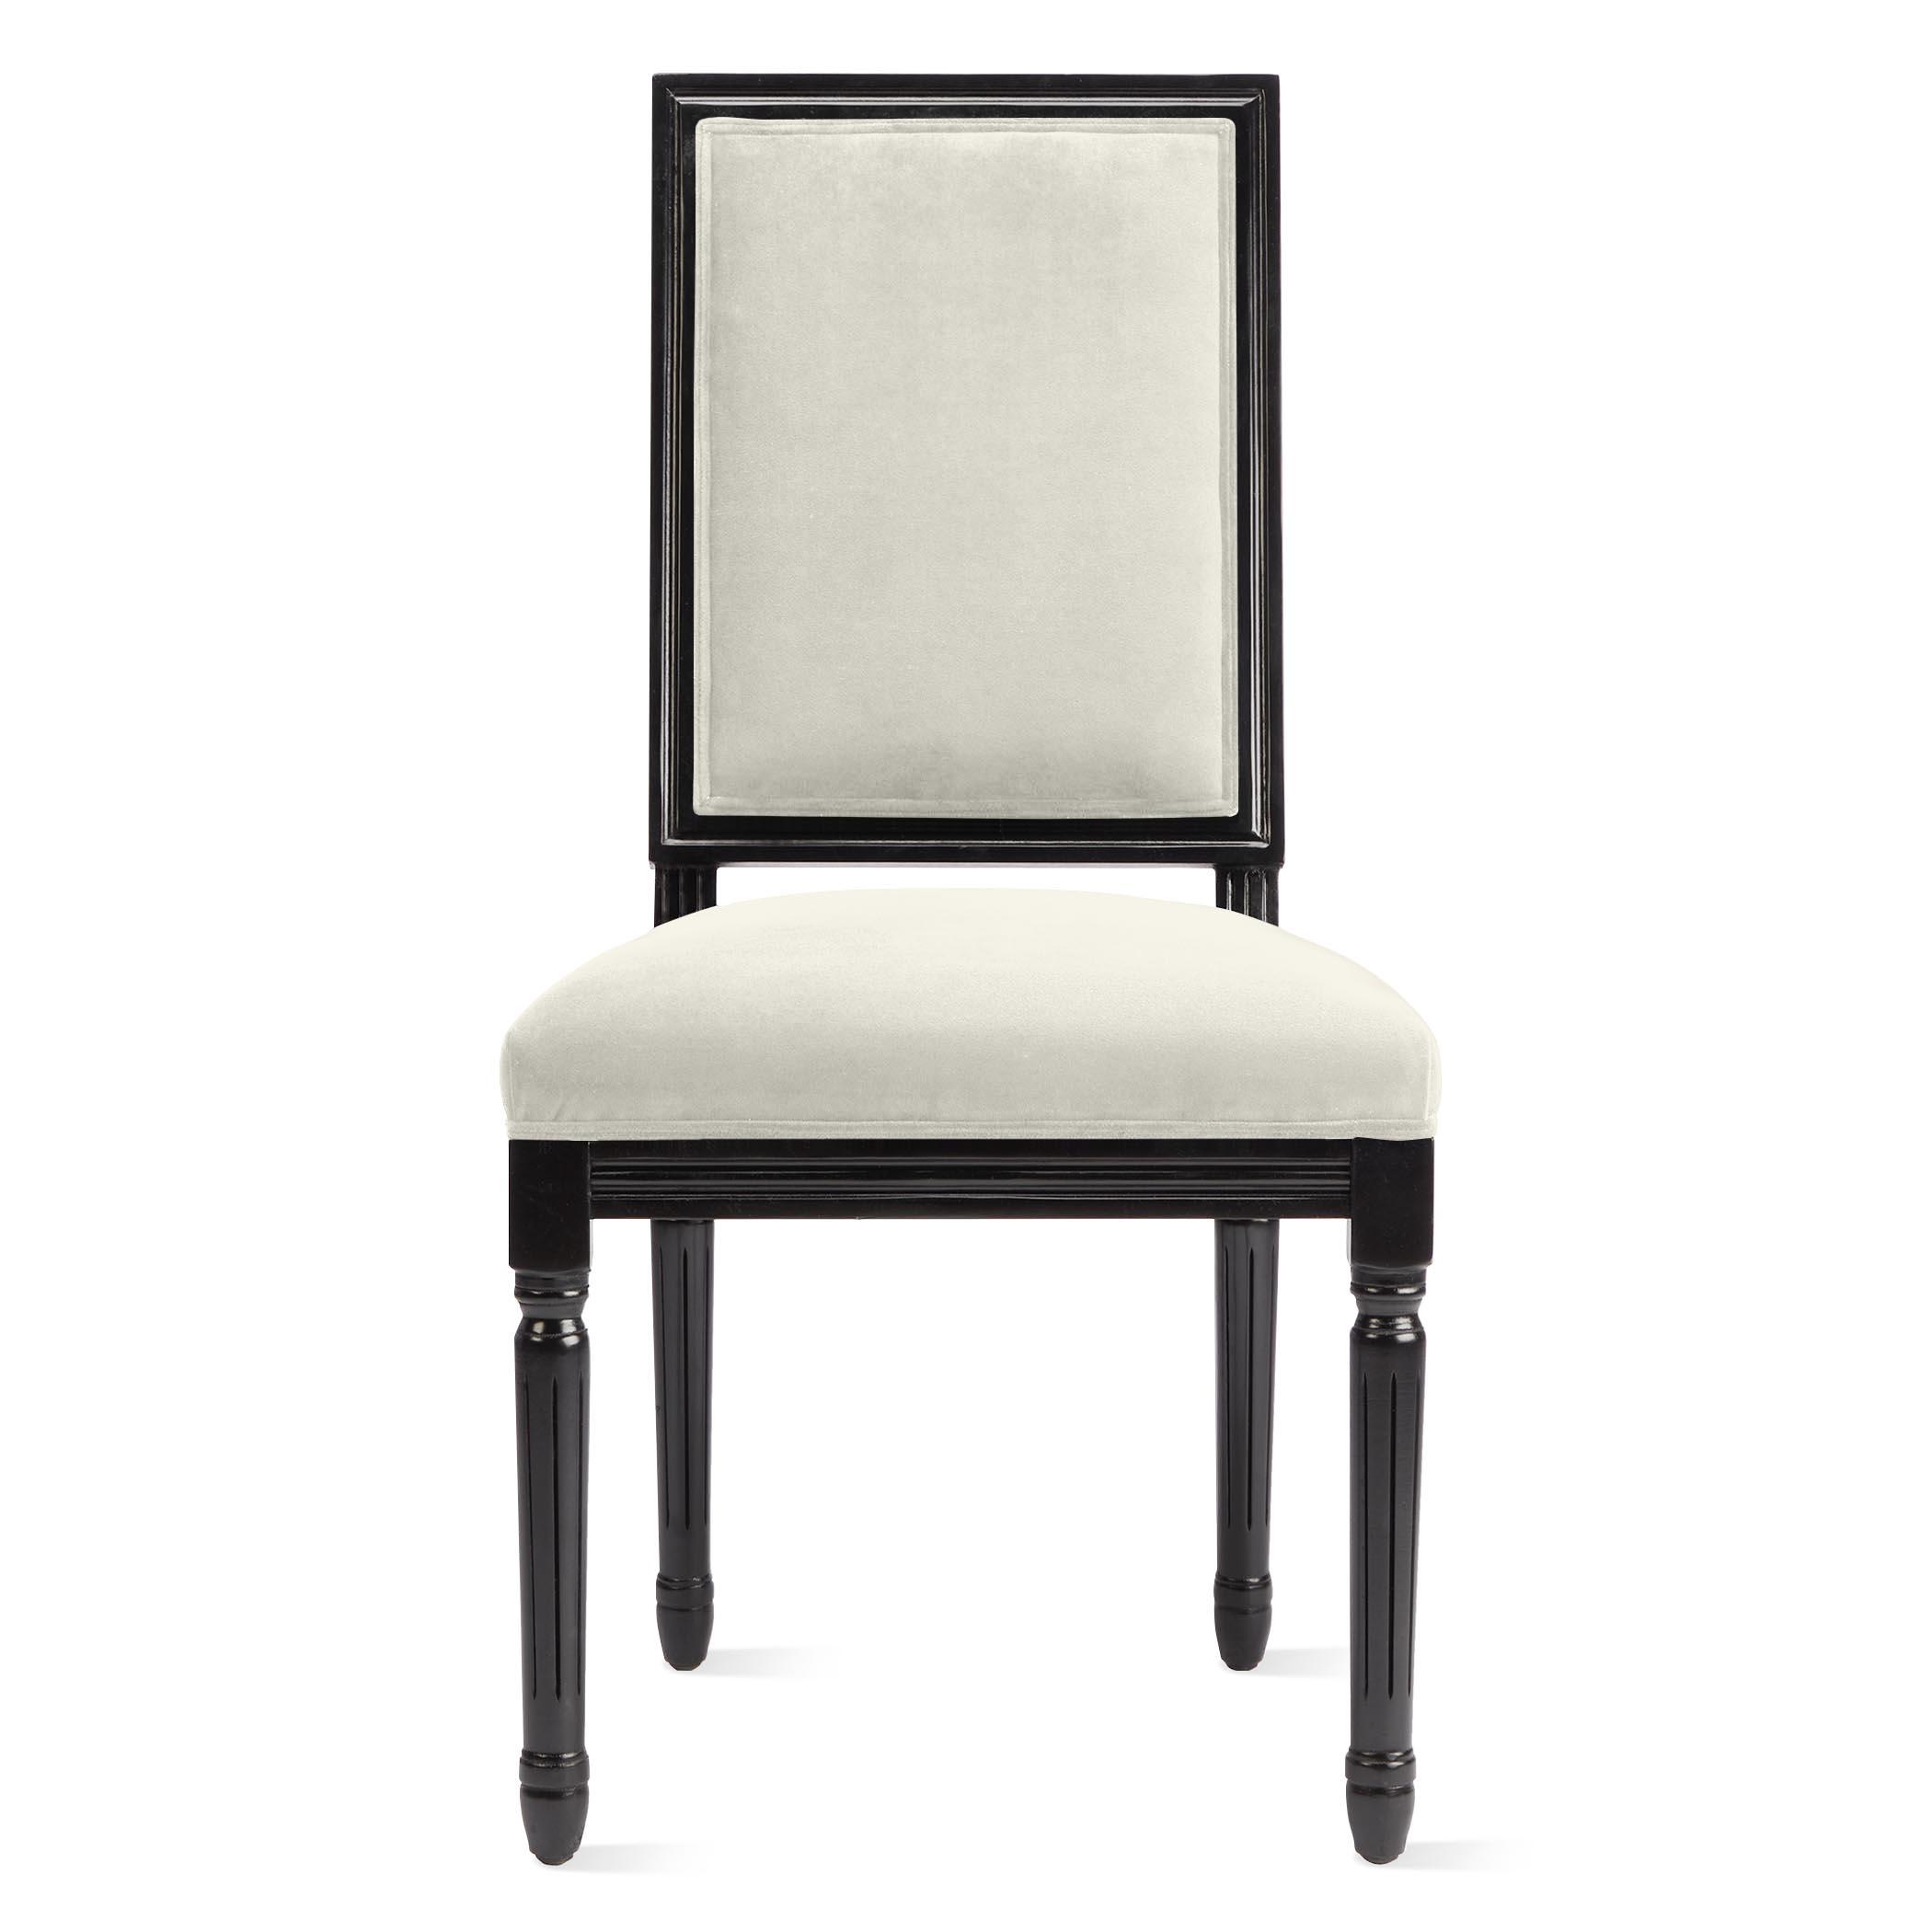 Callan Dining Chair - High Gloss Black